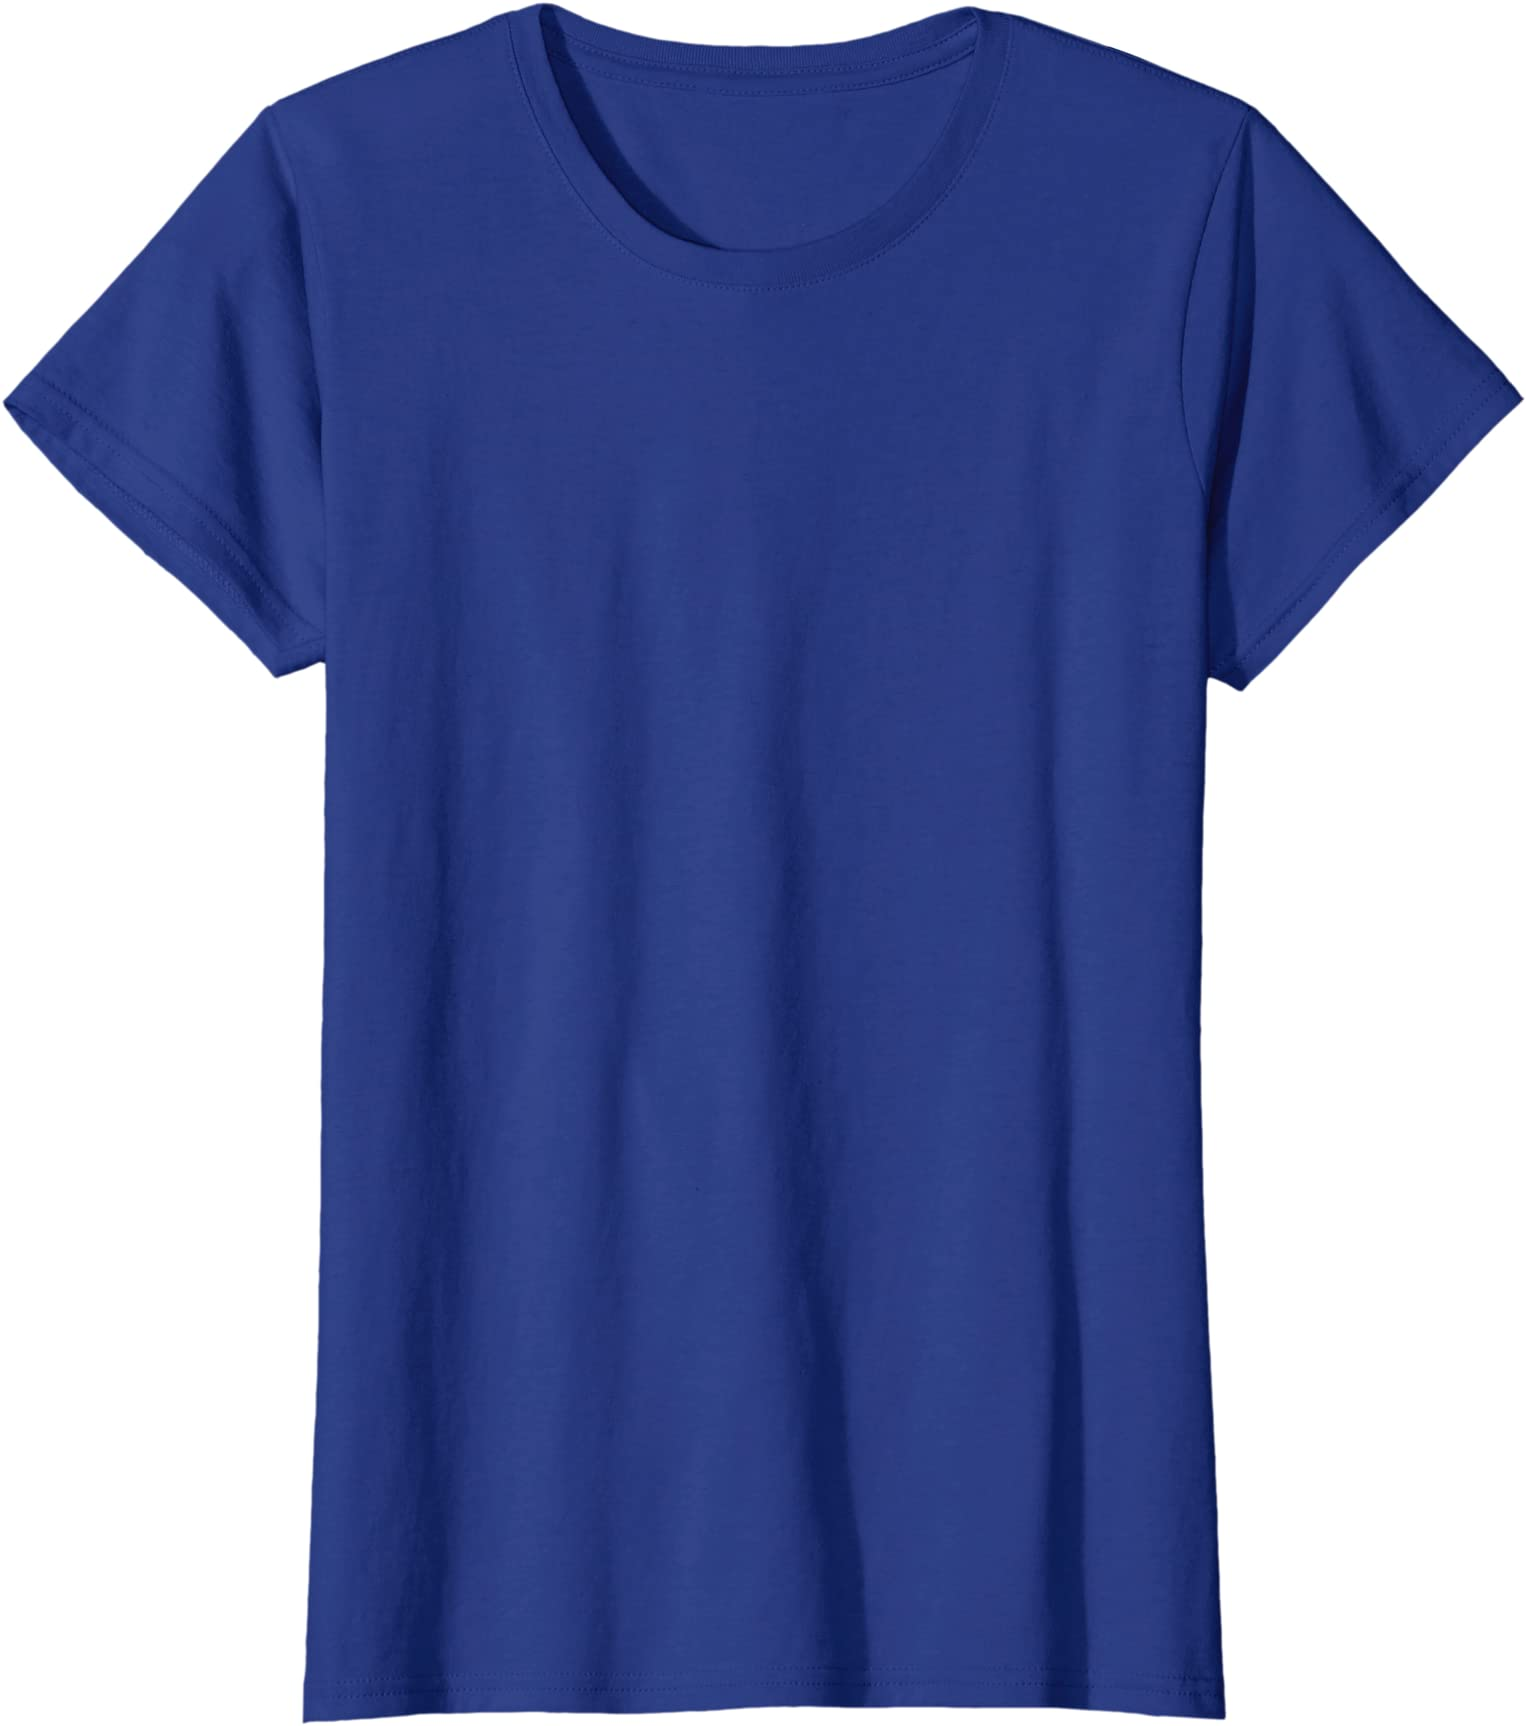 Keep On Keepin On Navy Adult T-Shirt